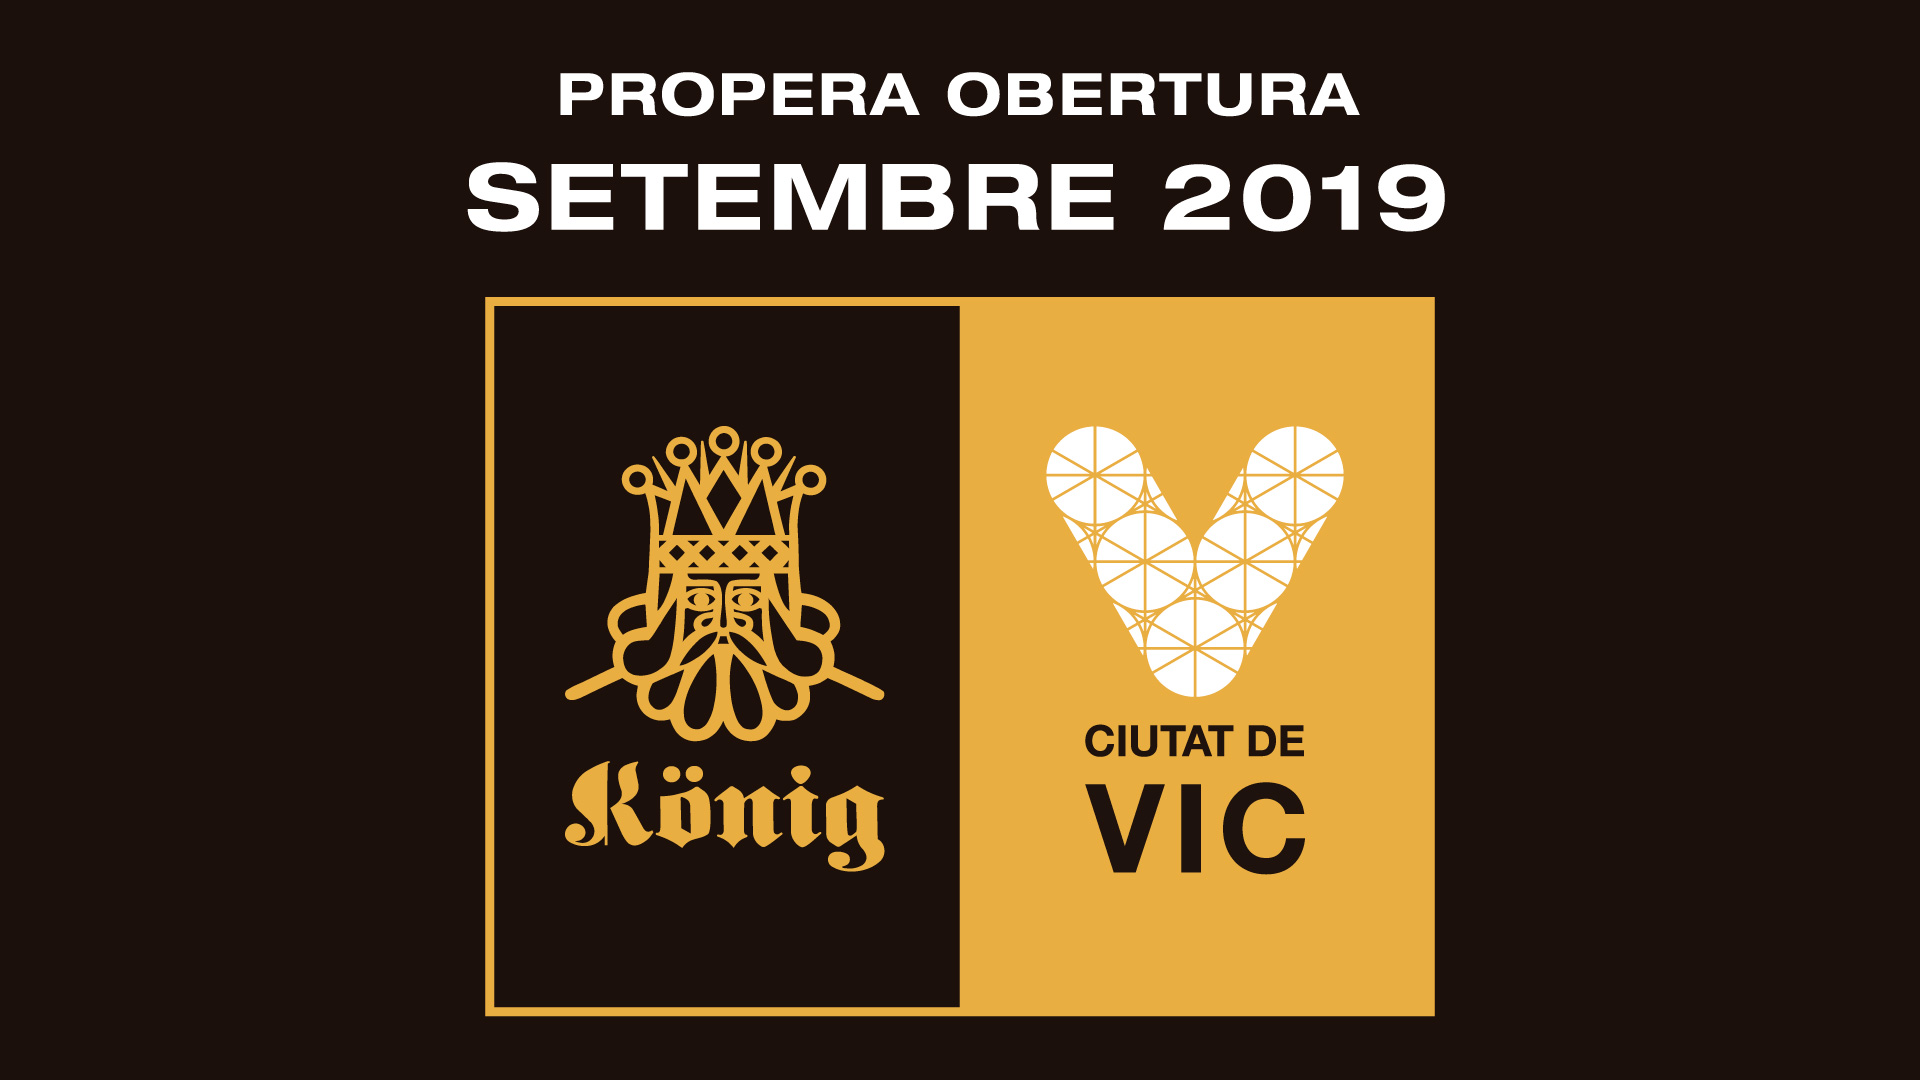 #konig_vic